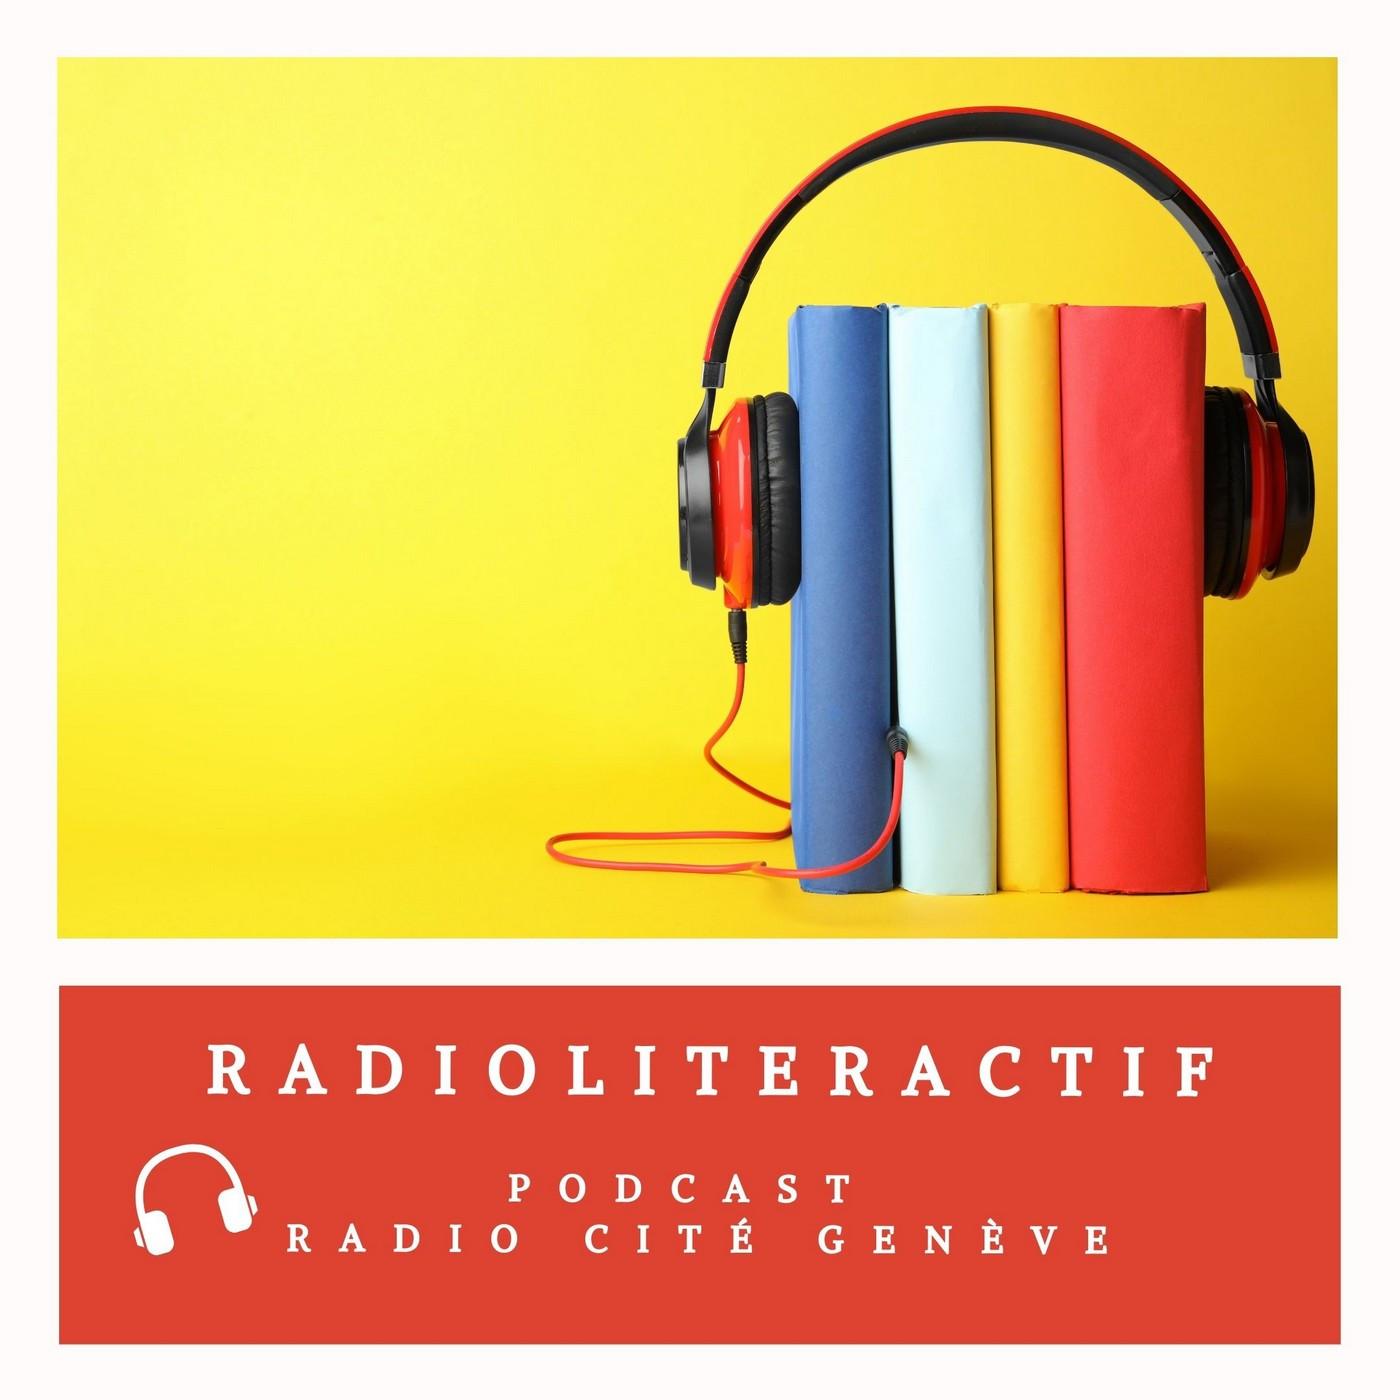 Radioliteractif du 08/02/2021 - Stéphane Blok